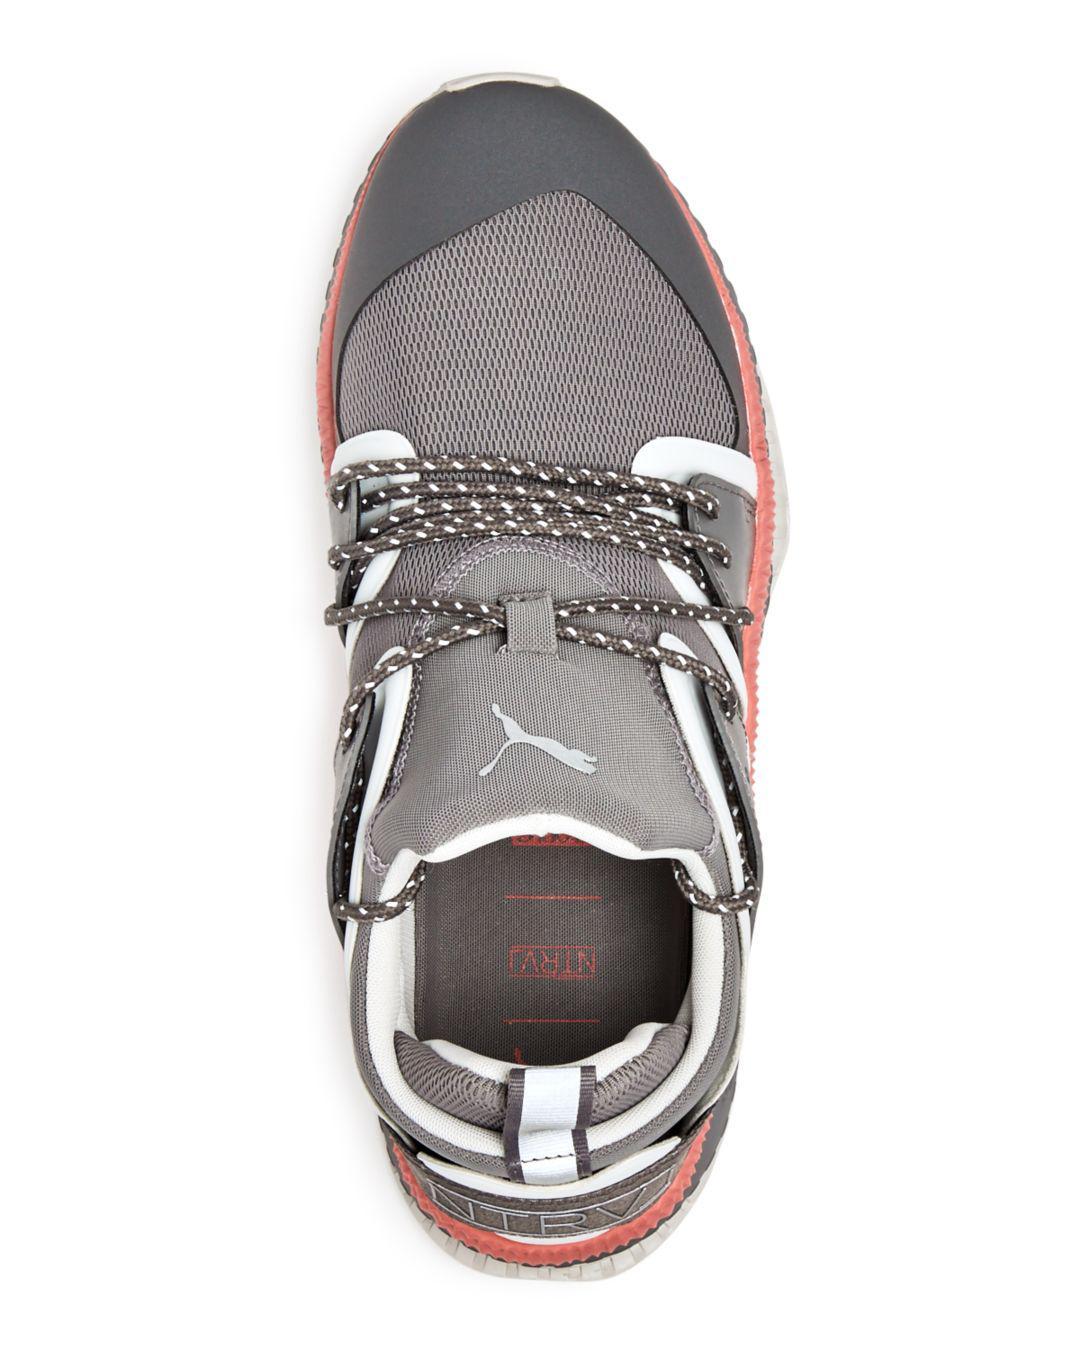 a30cd5159fdd Puma Men s Tsugi Blaze Staple Lace Up Sneakers in Gray for Men - Lyst